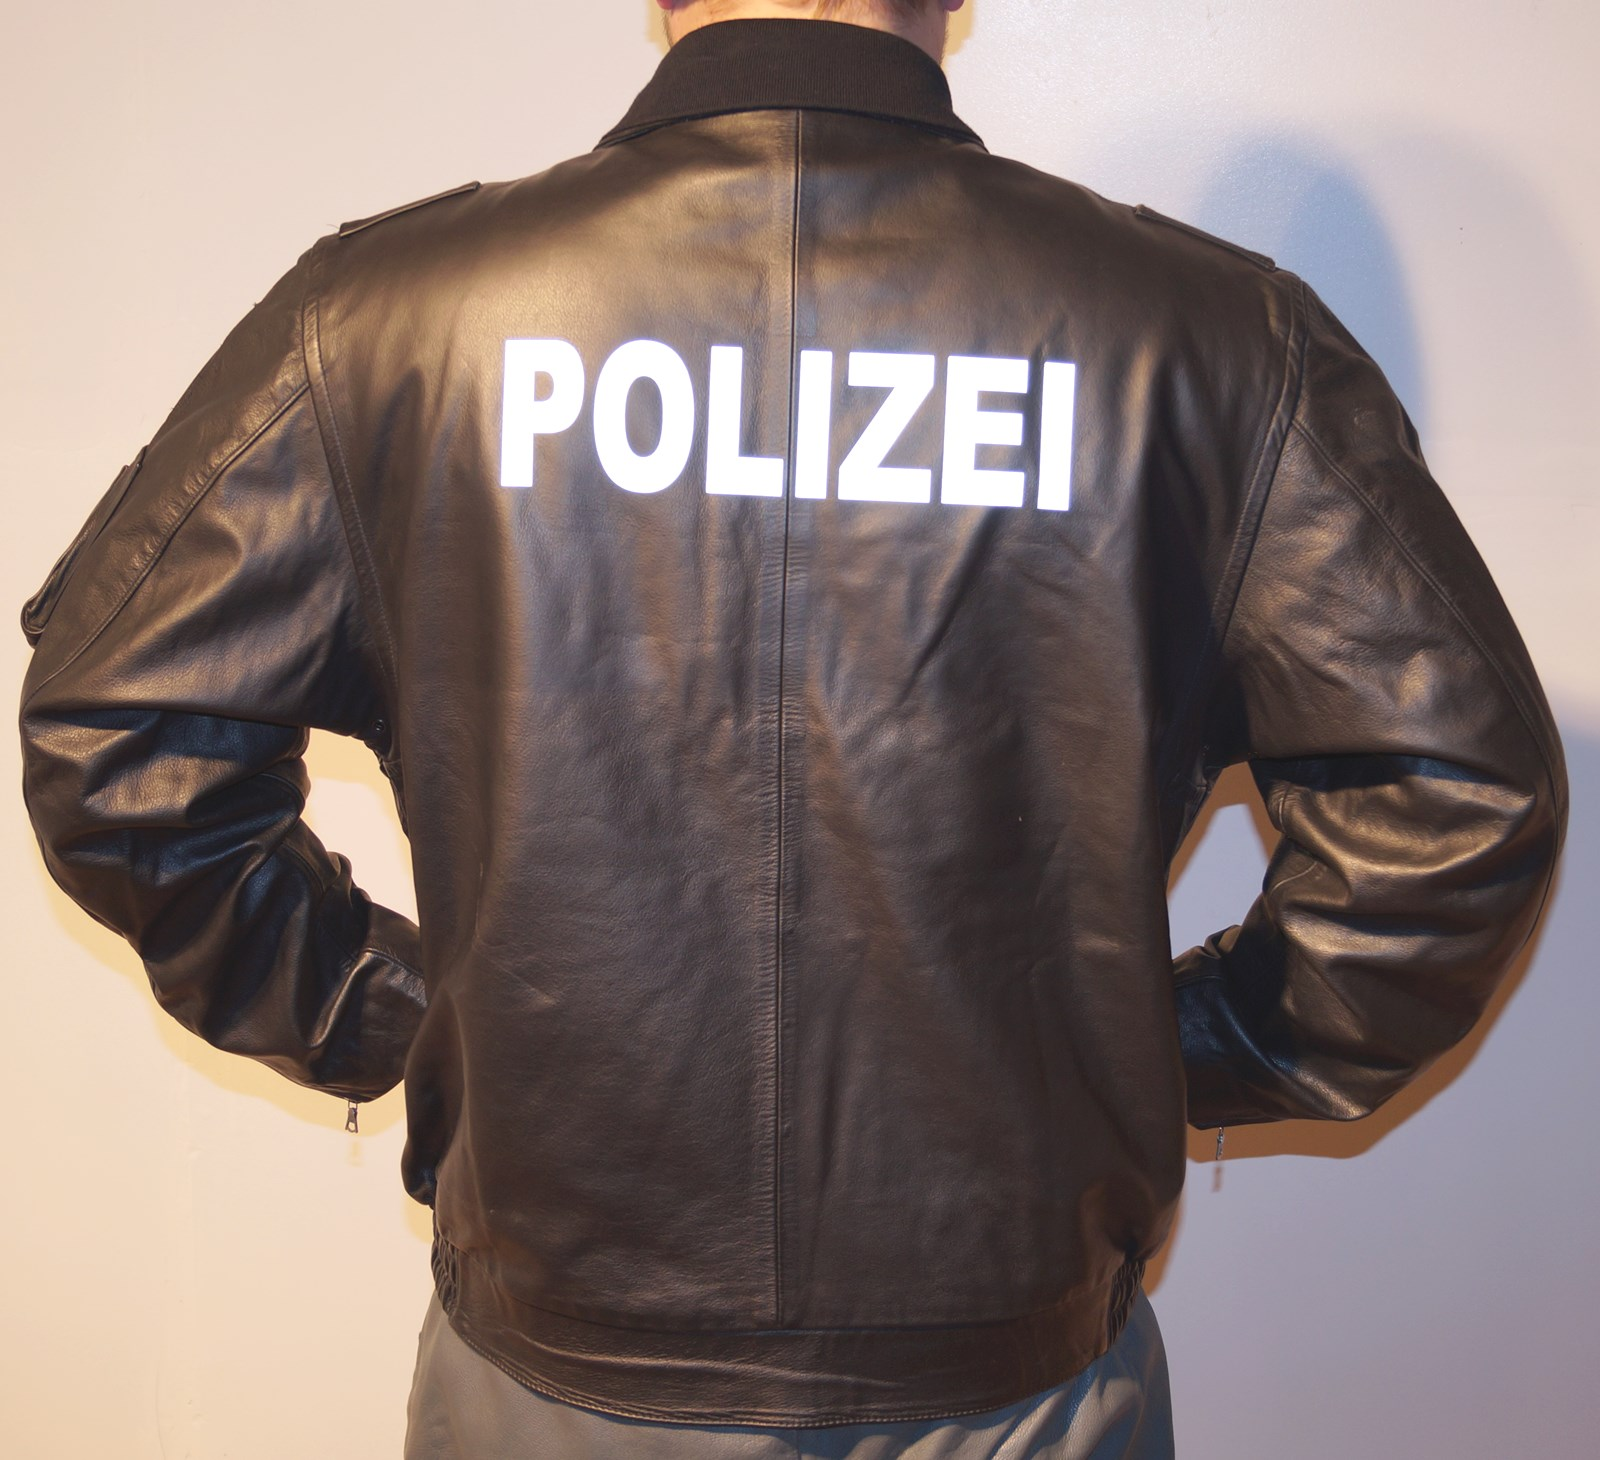 low priced 6d453 2c840 Original Polizei Lederjacke - Konkurse Zerbst